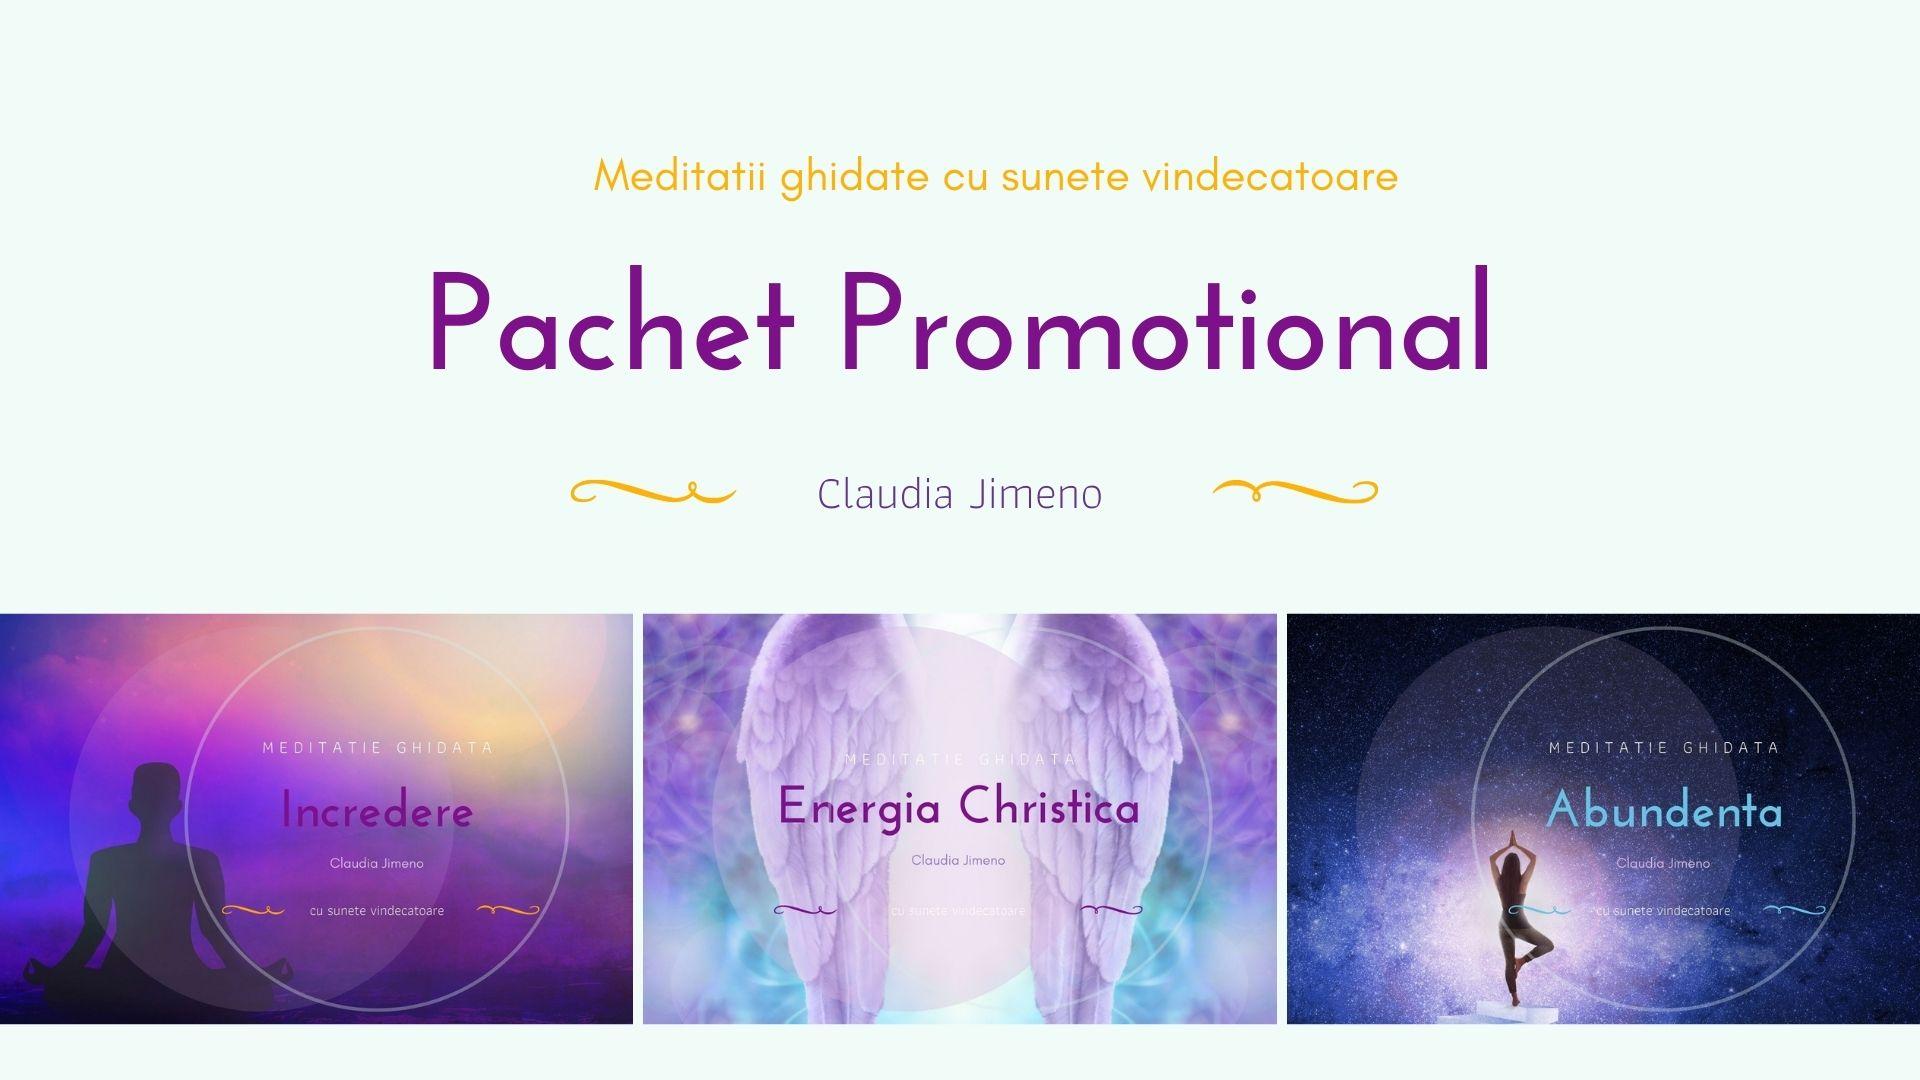 Pachet promotional meditatii